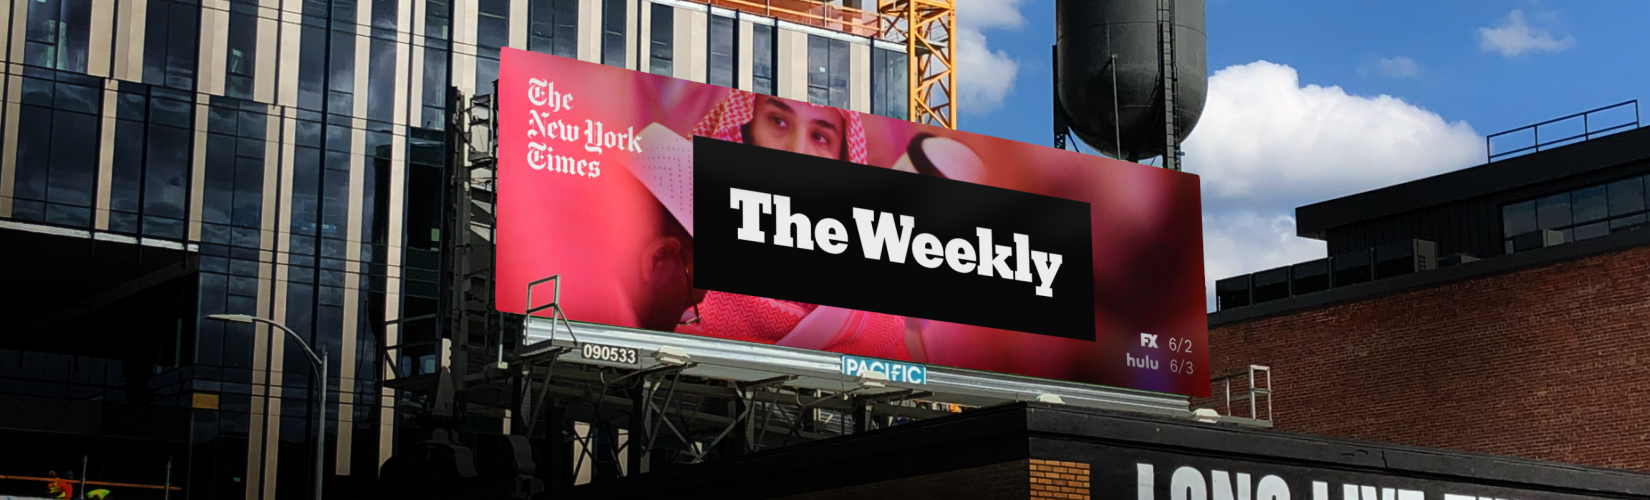 NYTW_Billboard_Insitu3.jpg